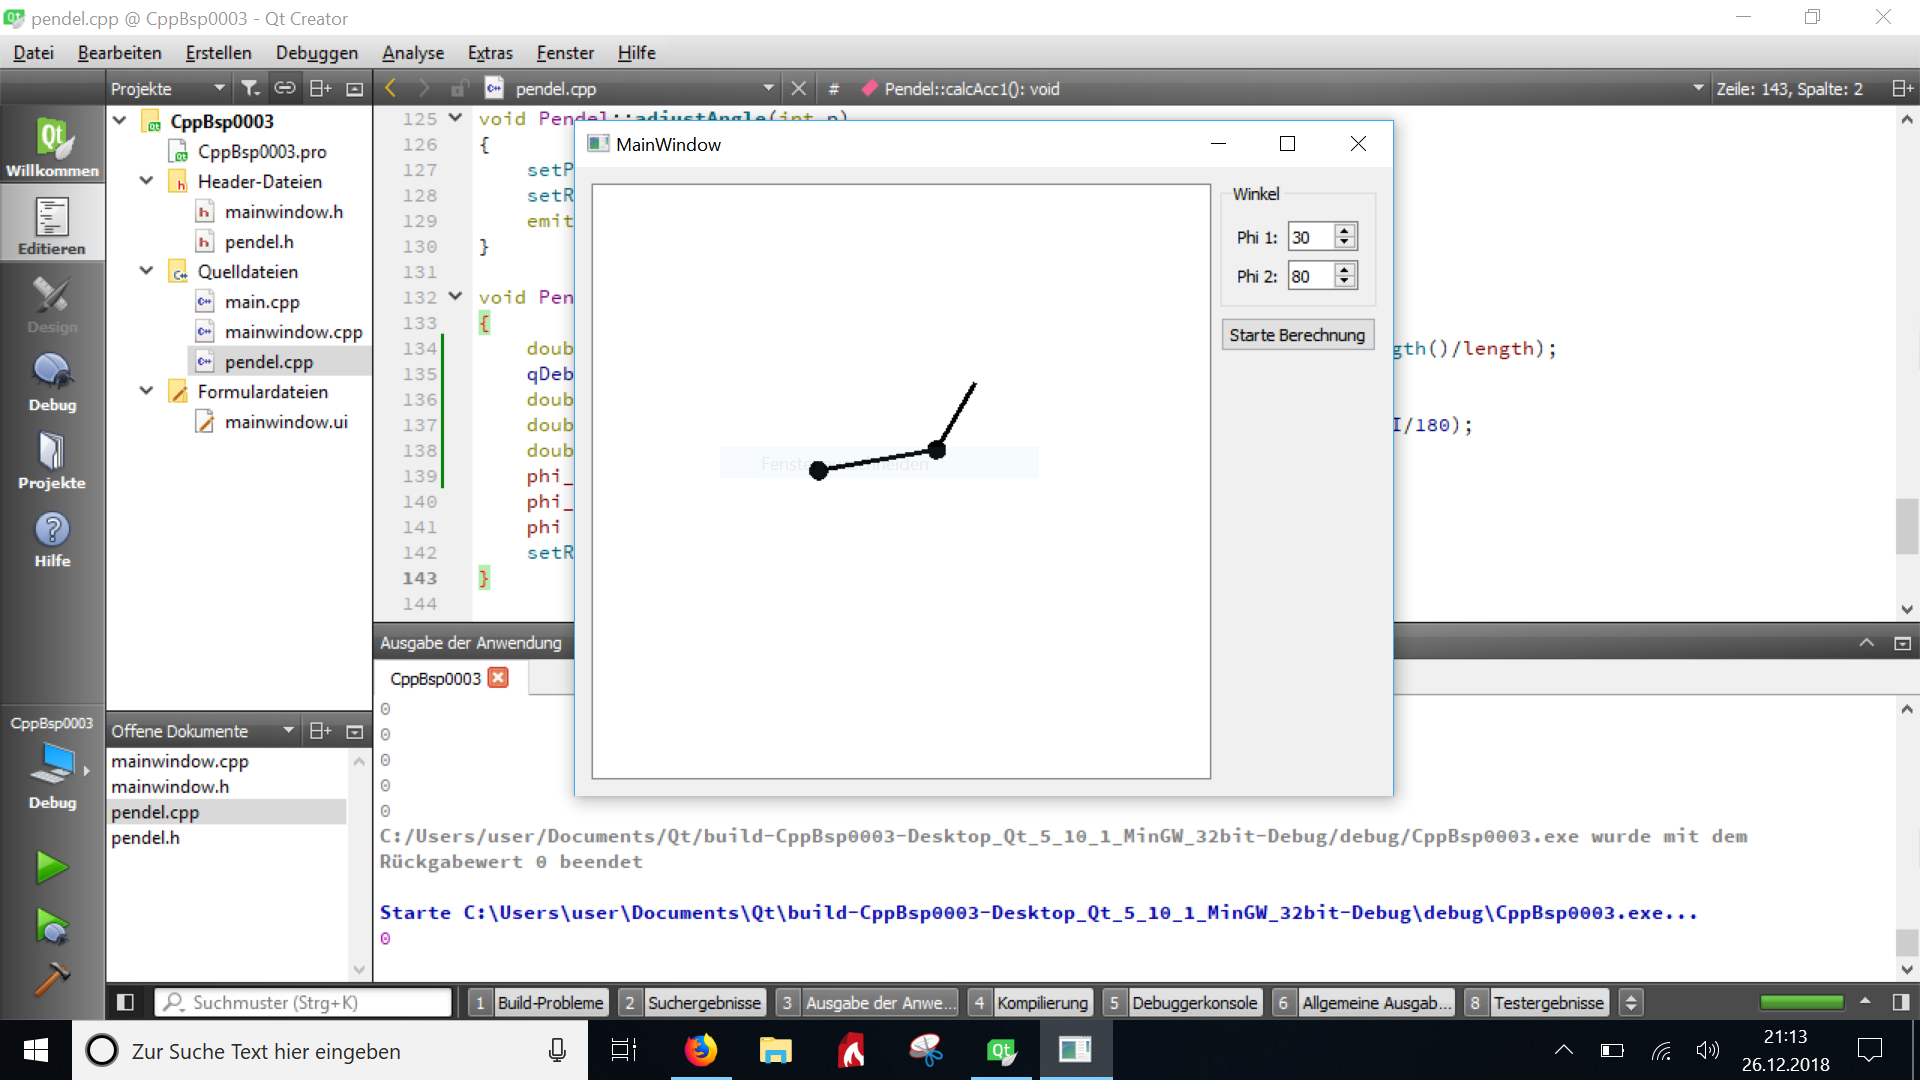 0_1545855285675_double Pendulum.PNG